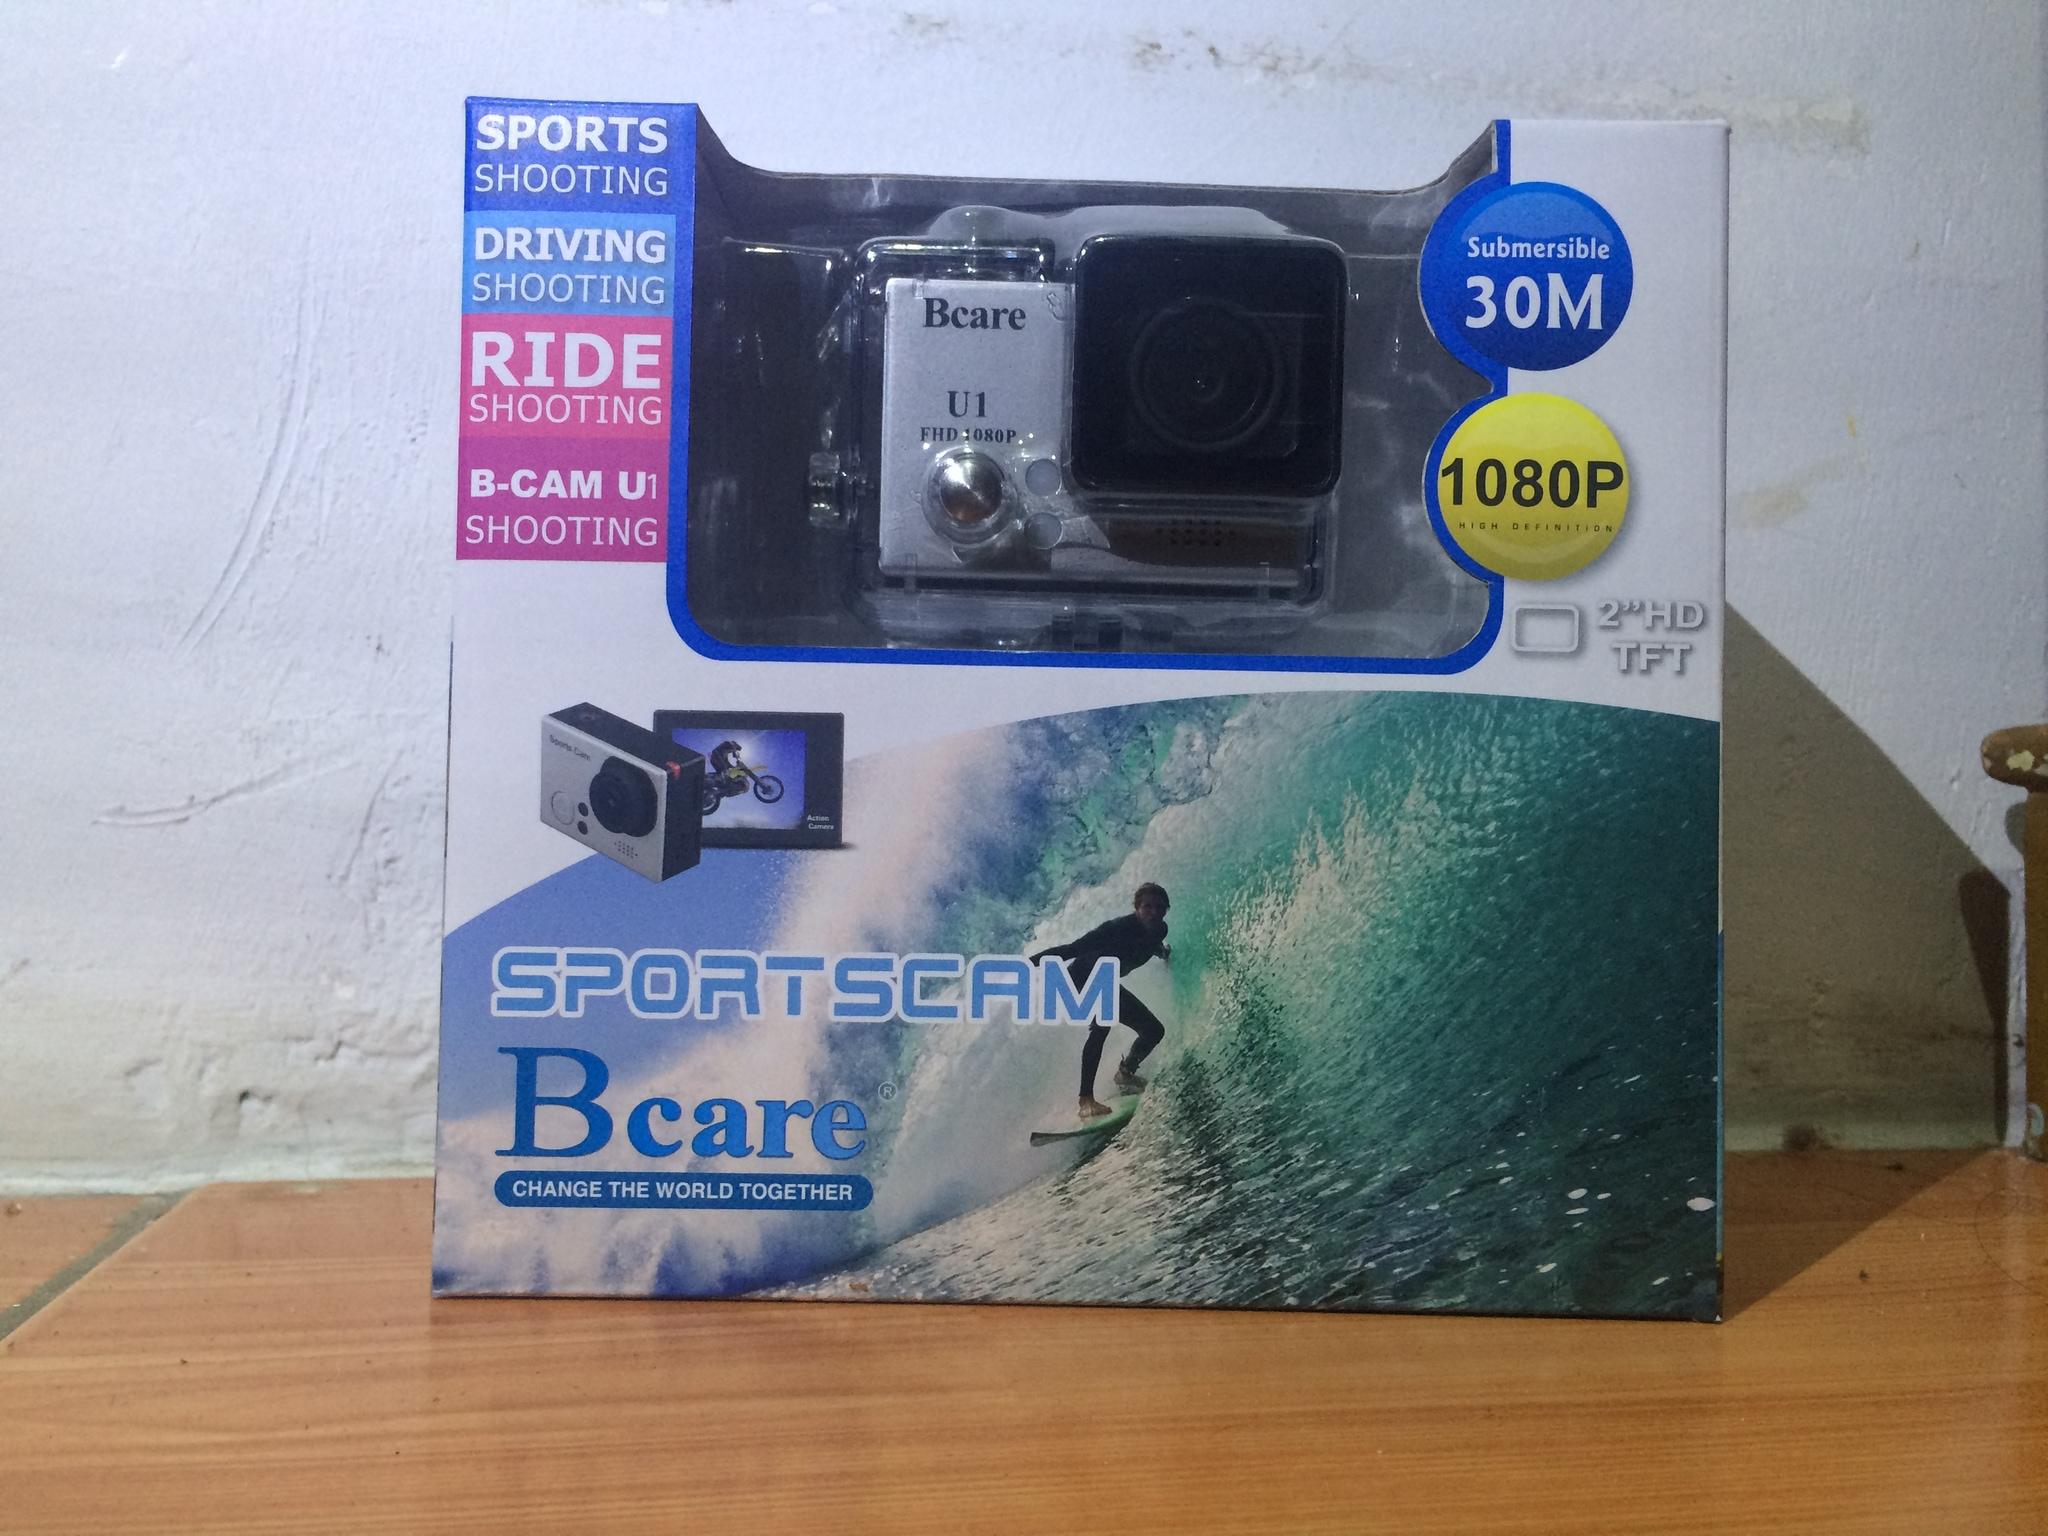 Jual Action Cam Bcare U1 Free Monopod Memory Card 16gb Batre 1 Flashdisk Ilovebogorshop Tokopedia